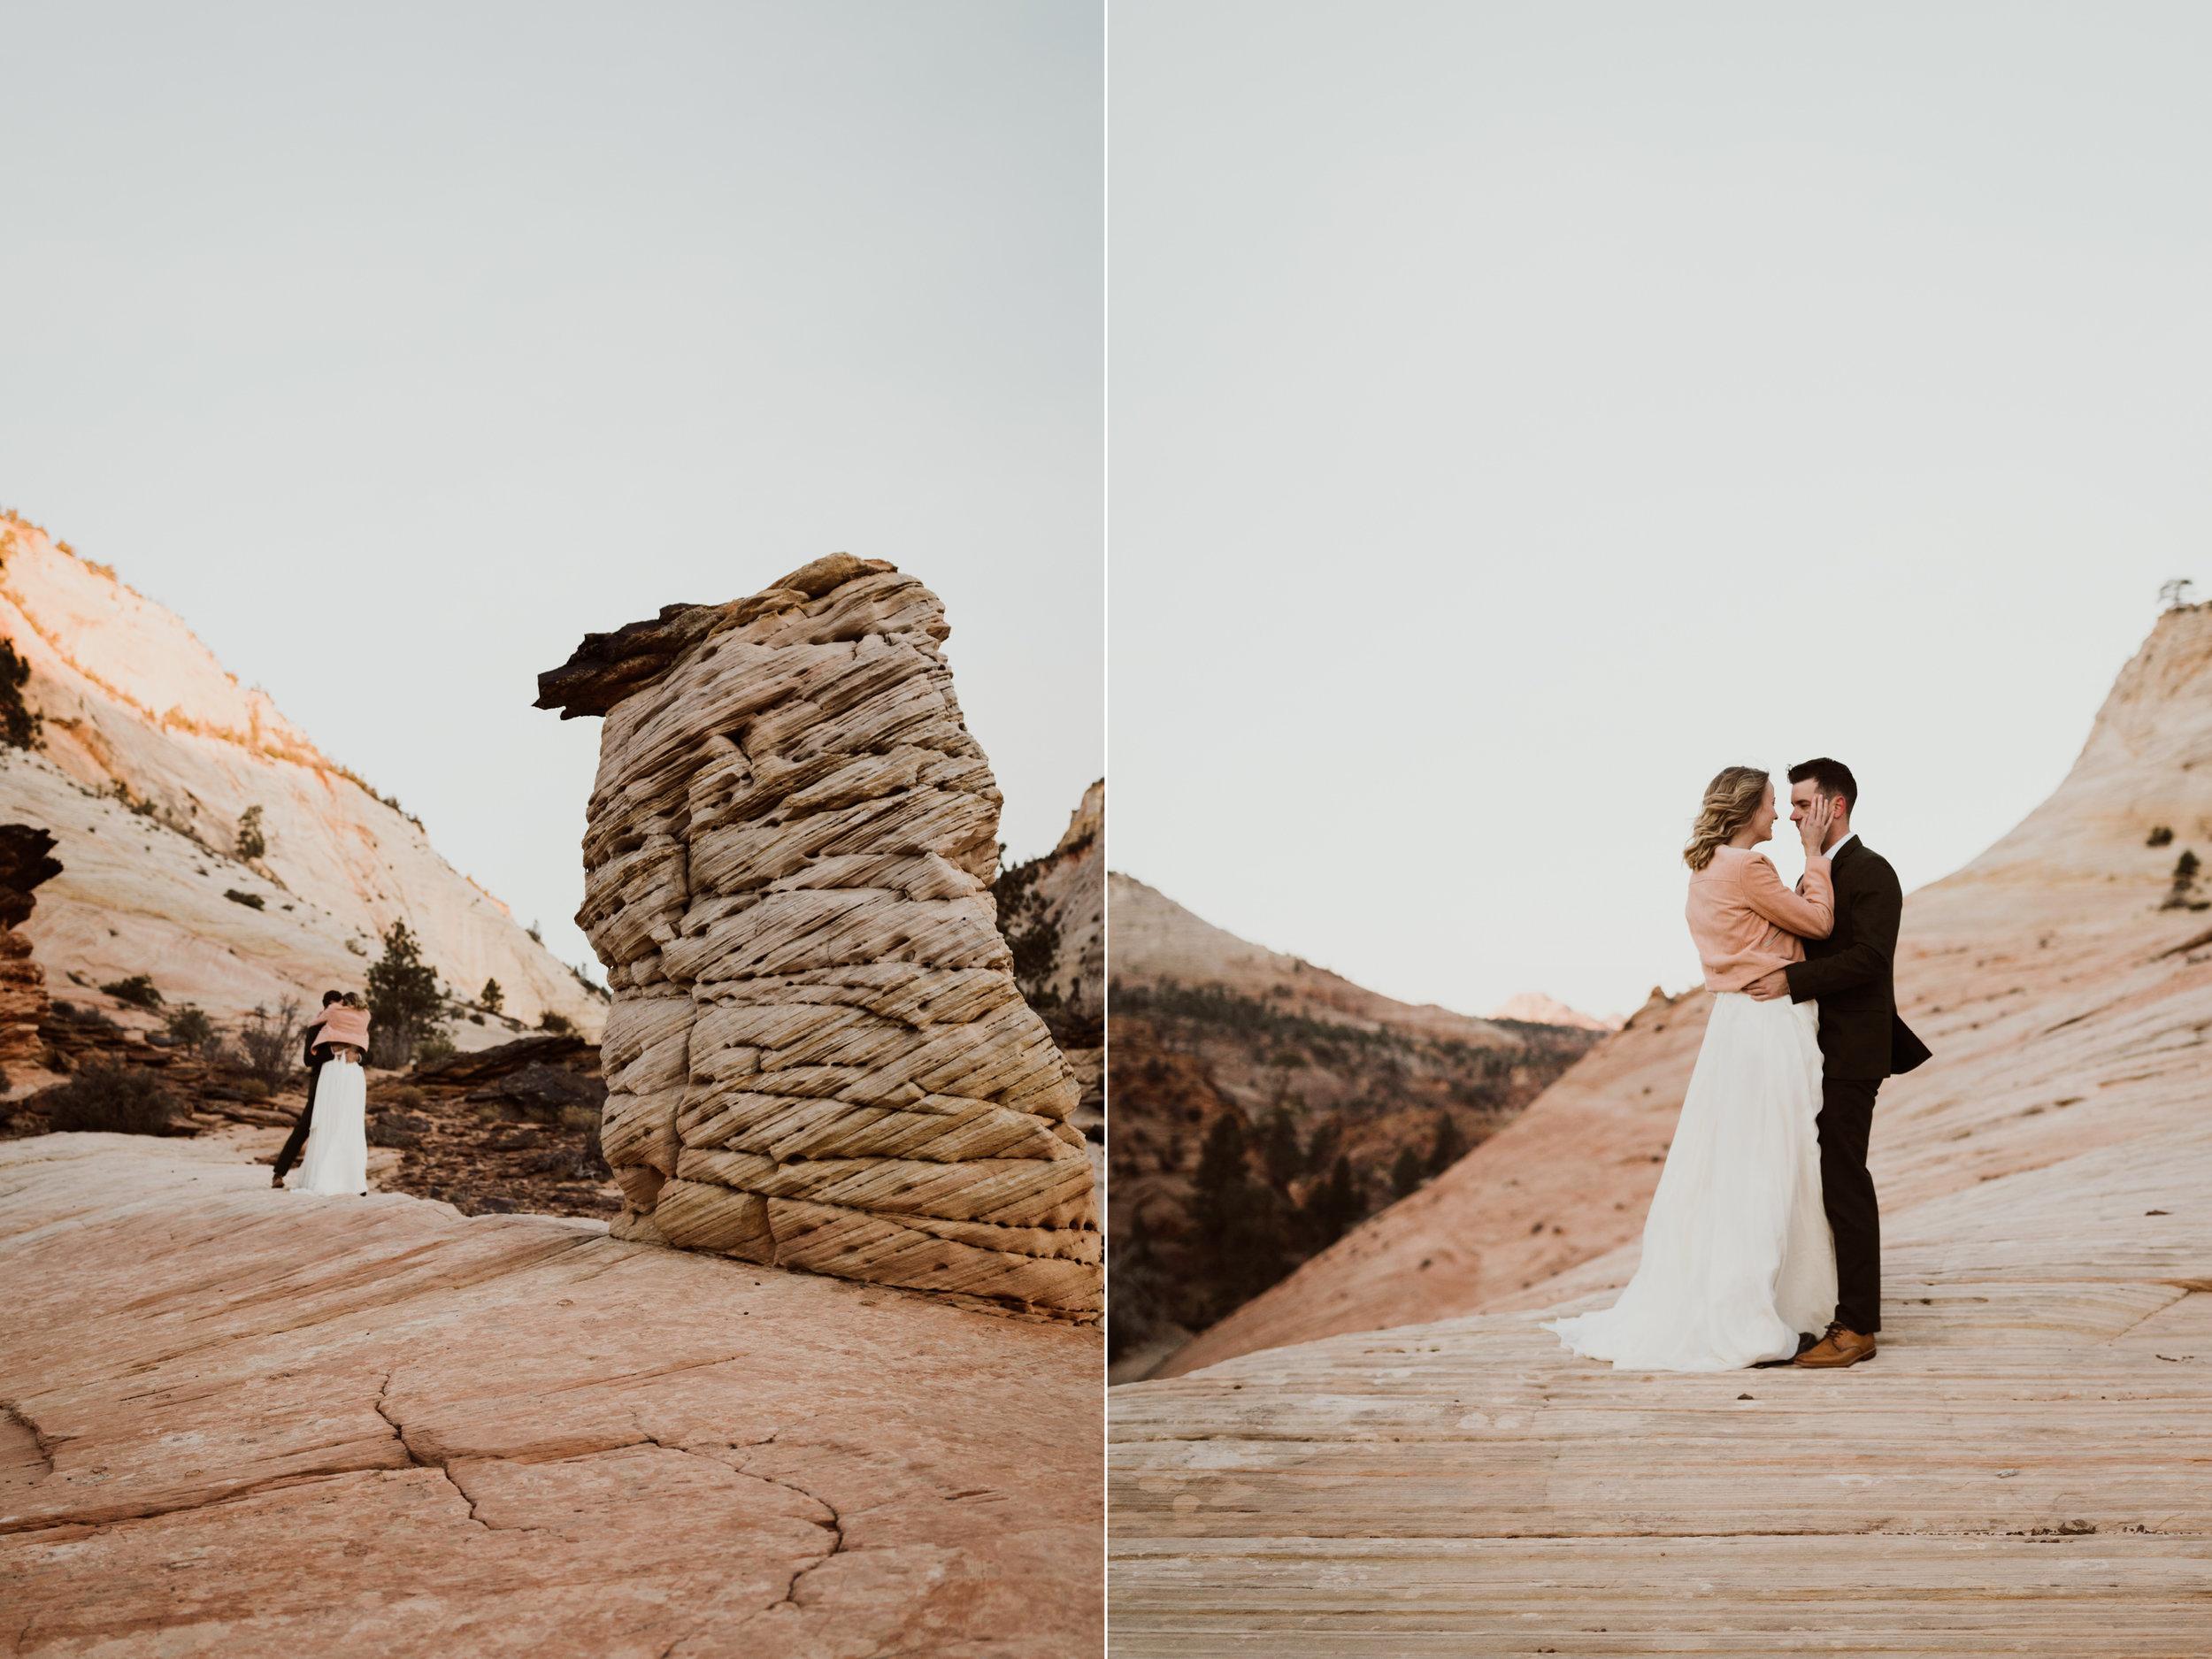 zion-national-park-wedding-153.jpg